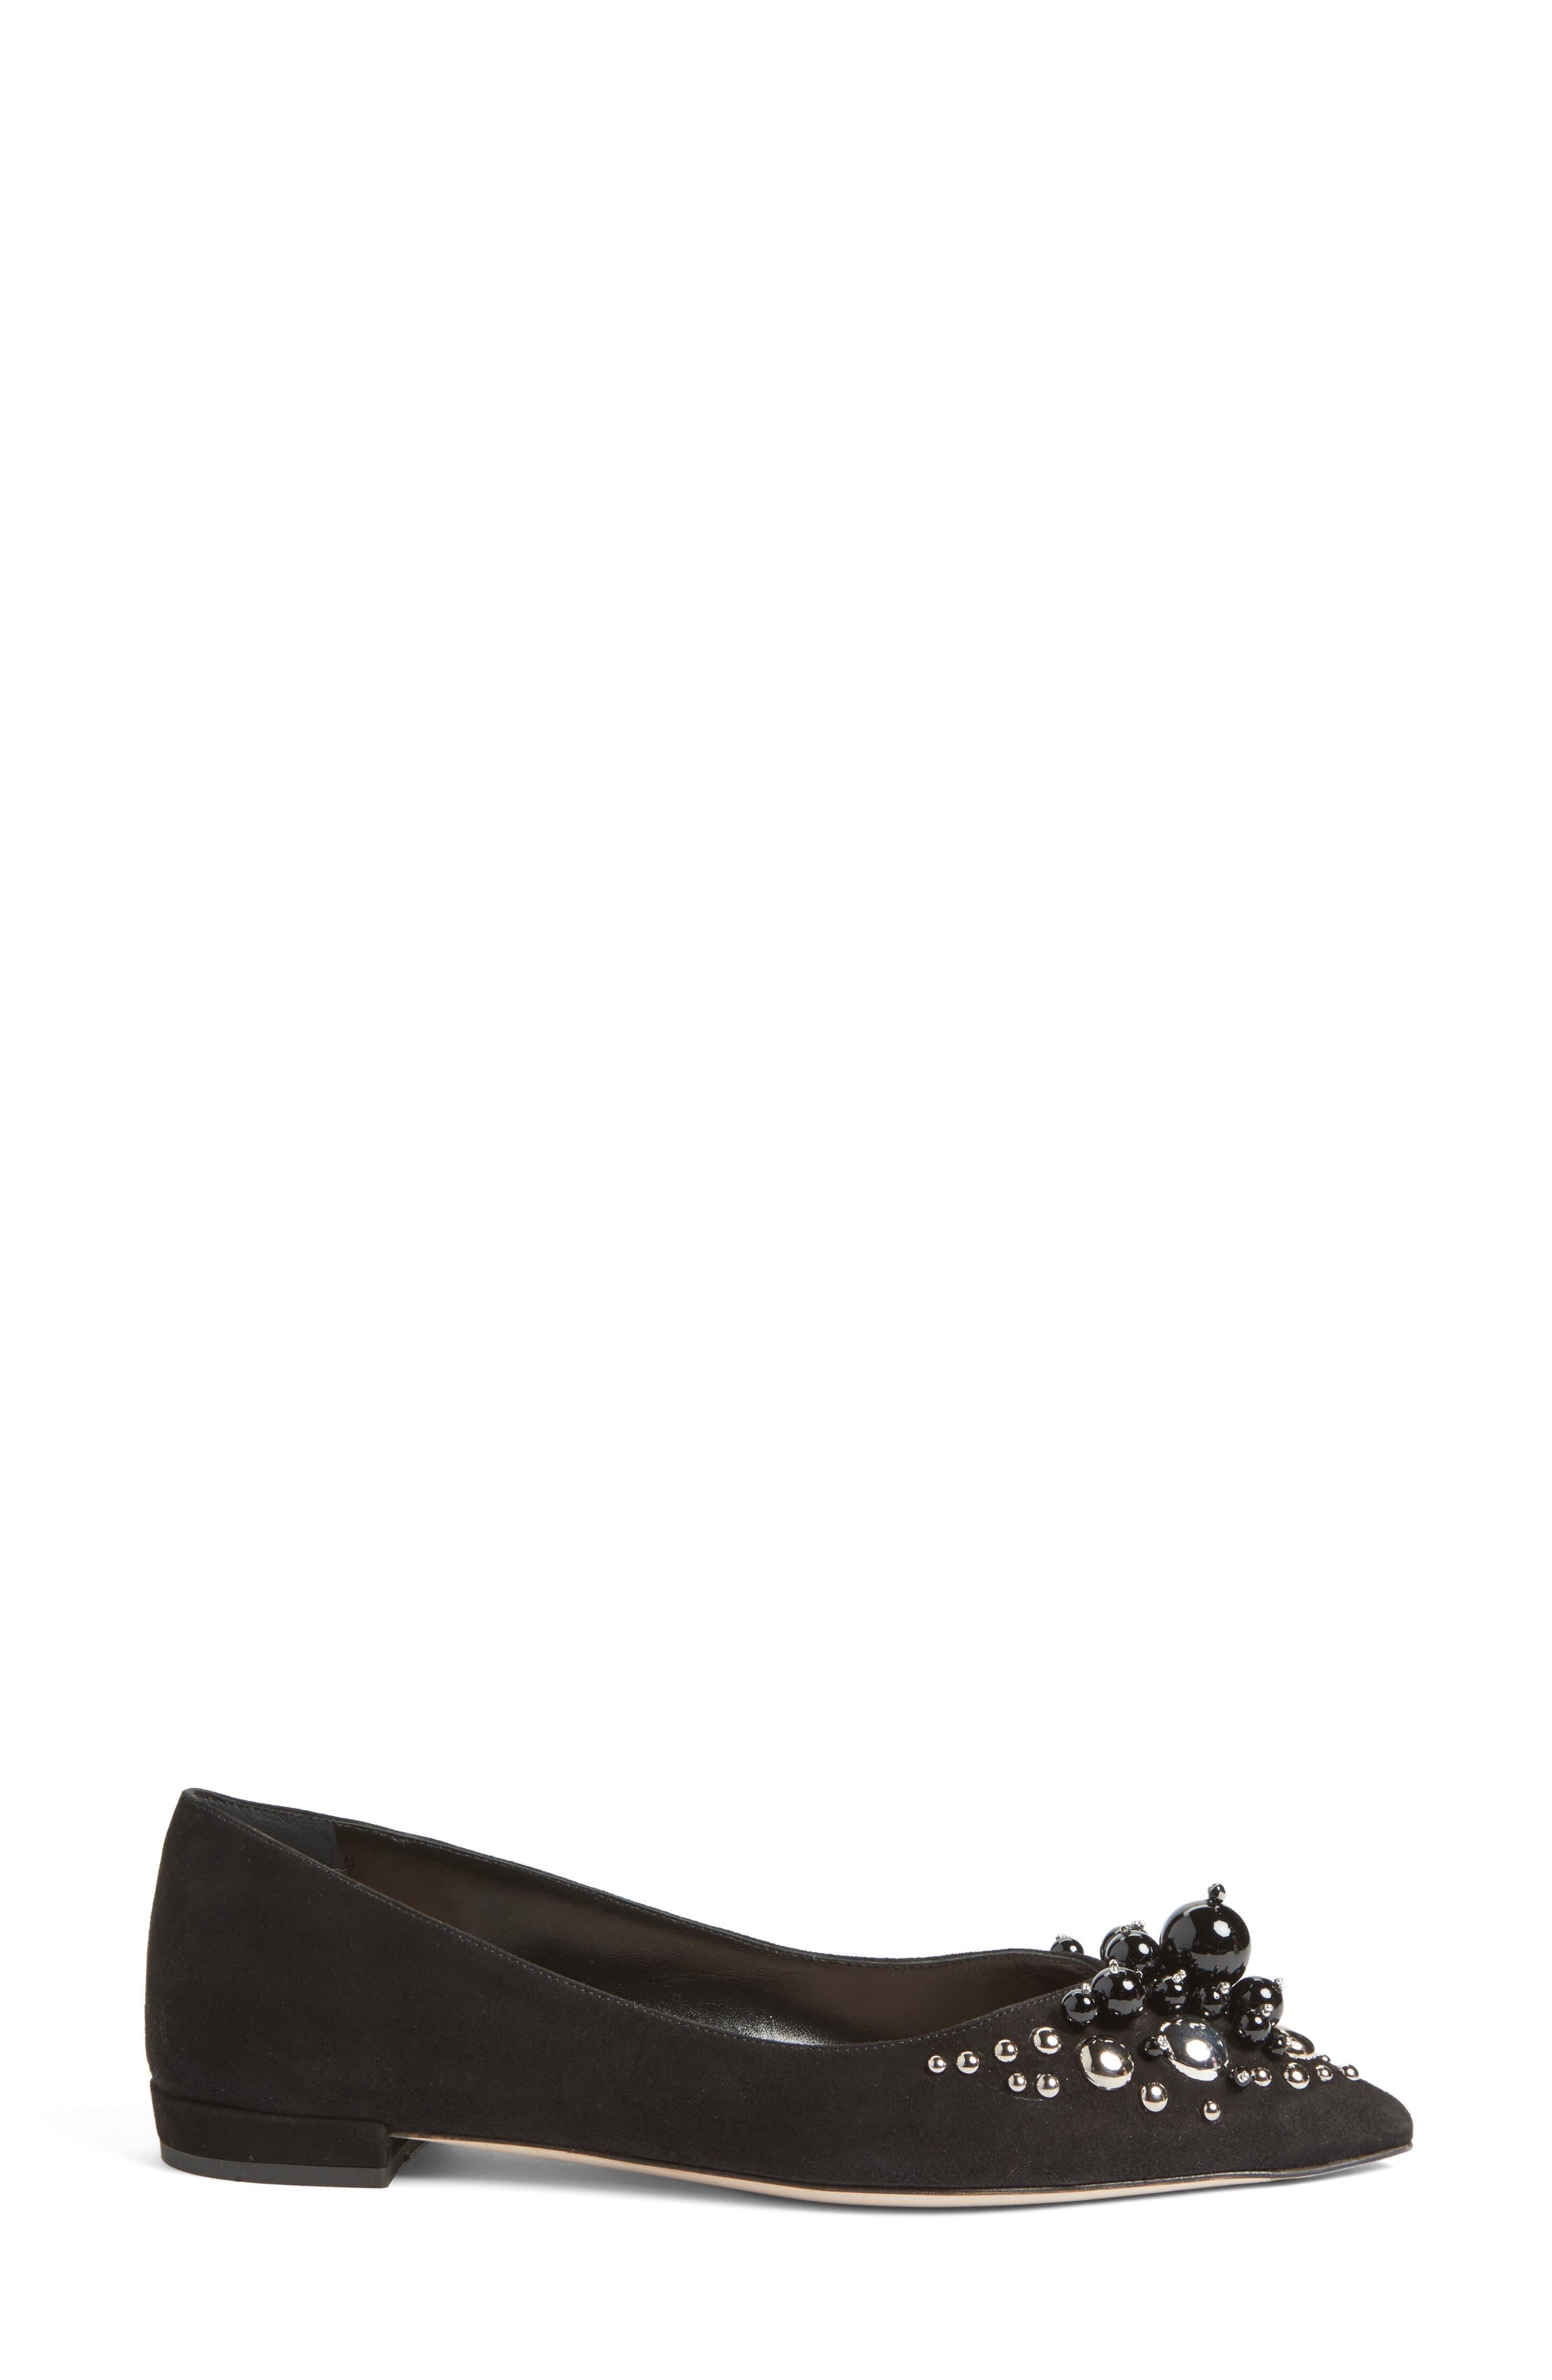 Alternate Image 3  - Miu Miu Embellished Pointy Toe Flat (Women)